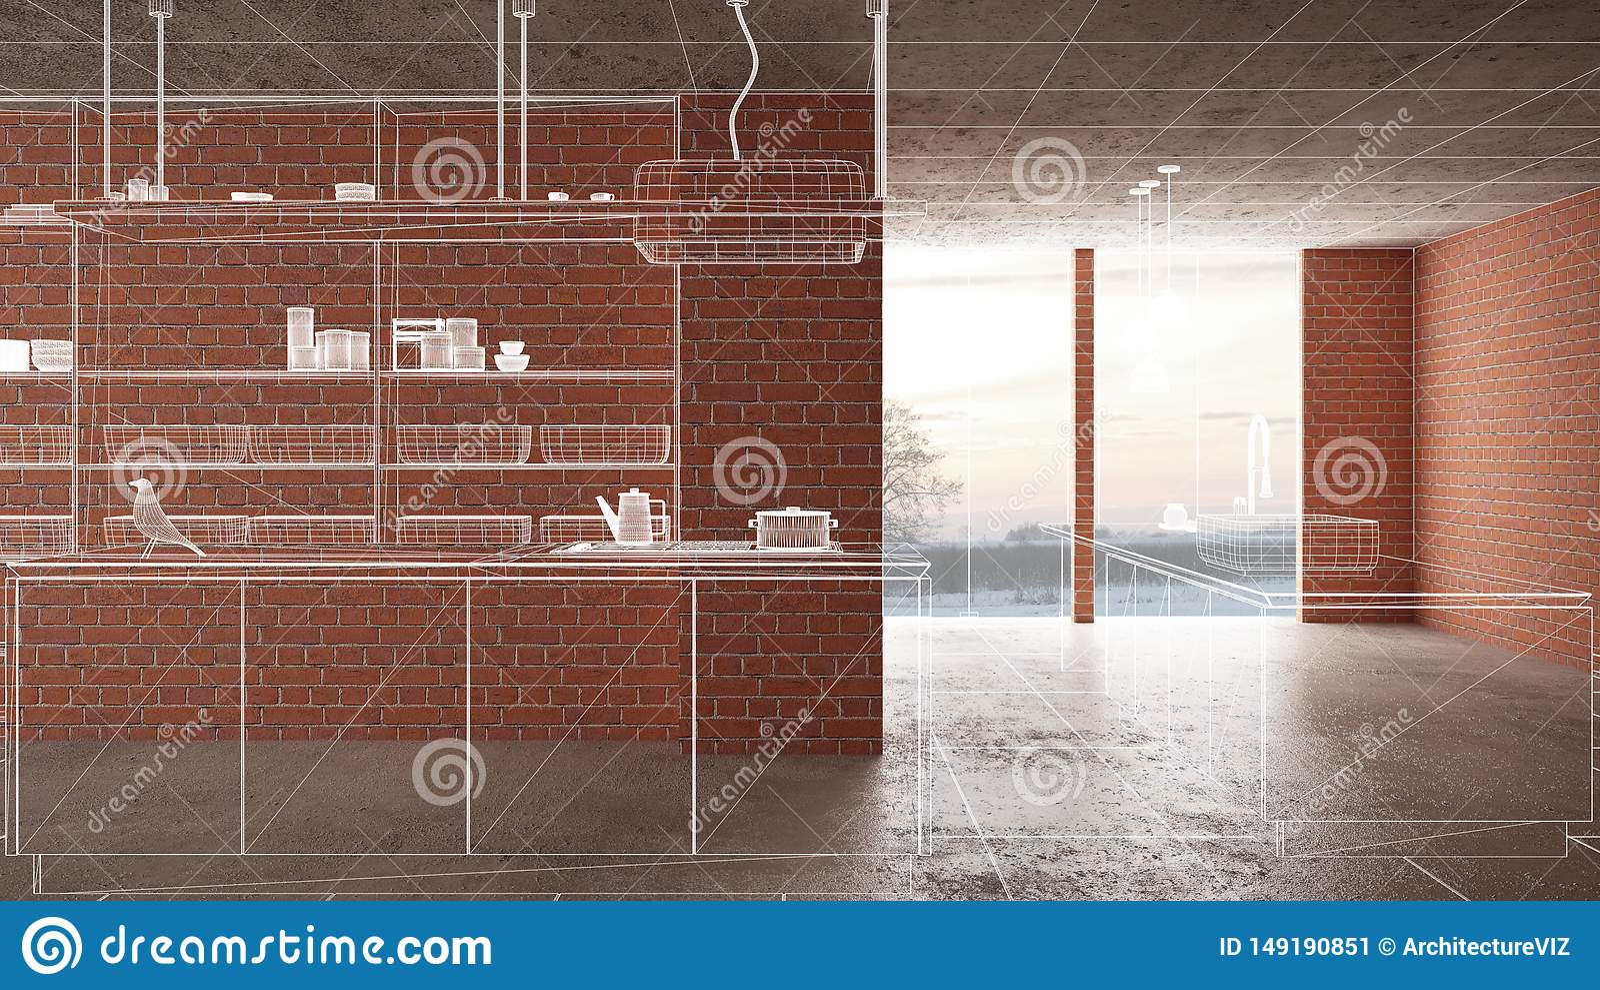 Home renovation, house development concept background, interior design under construction, custom architecture design project,